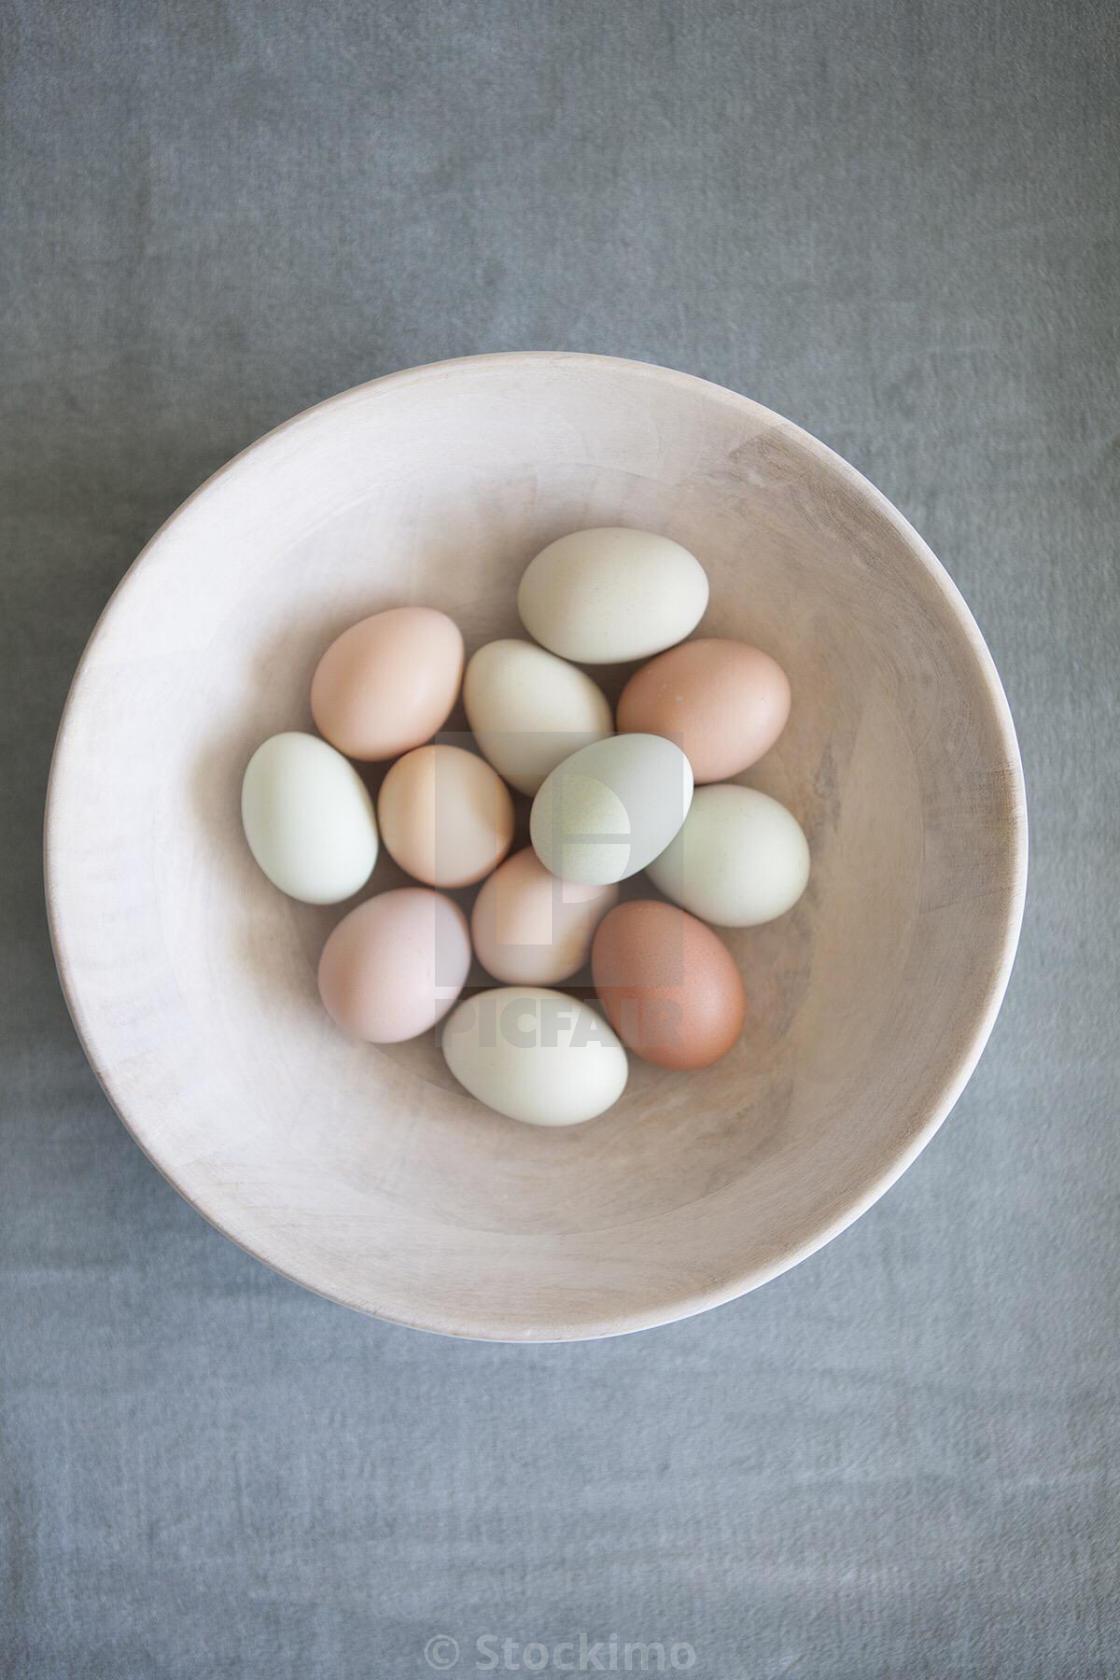 """Farm fresh eggs."" stock image"